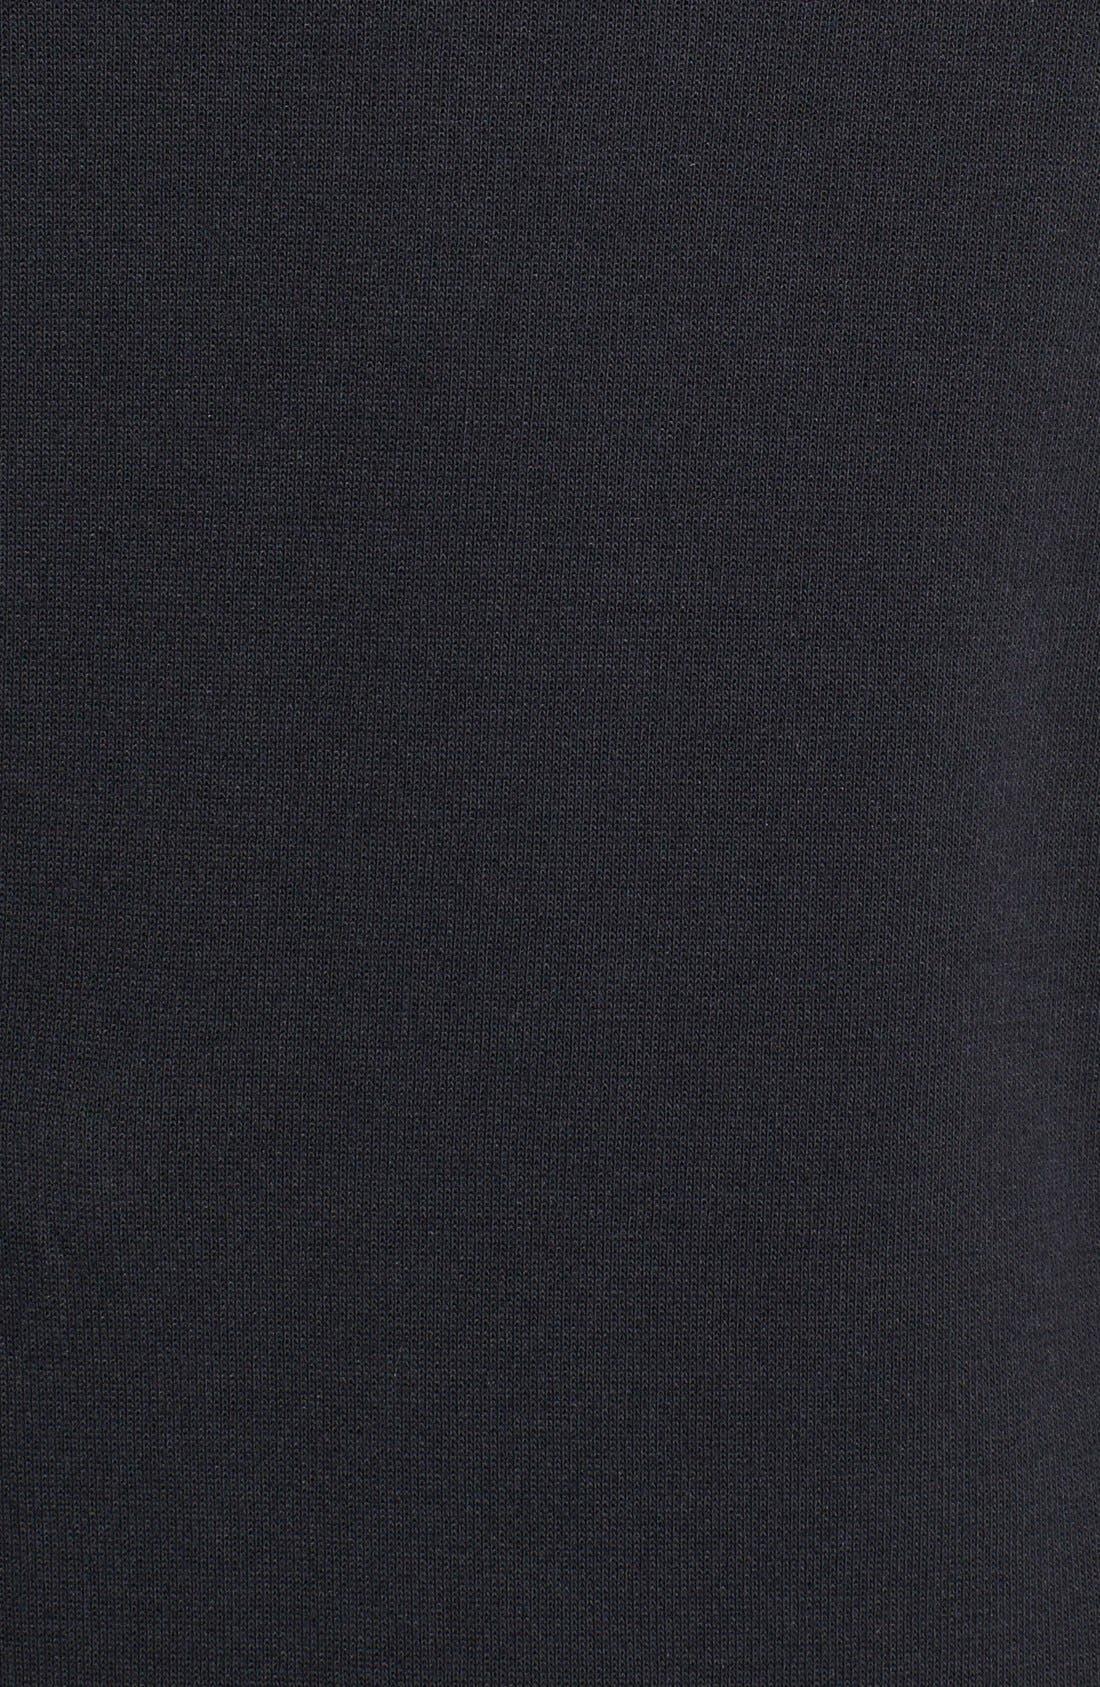 Alternate Image 3  - Nike 'Tech' Cape Jacket